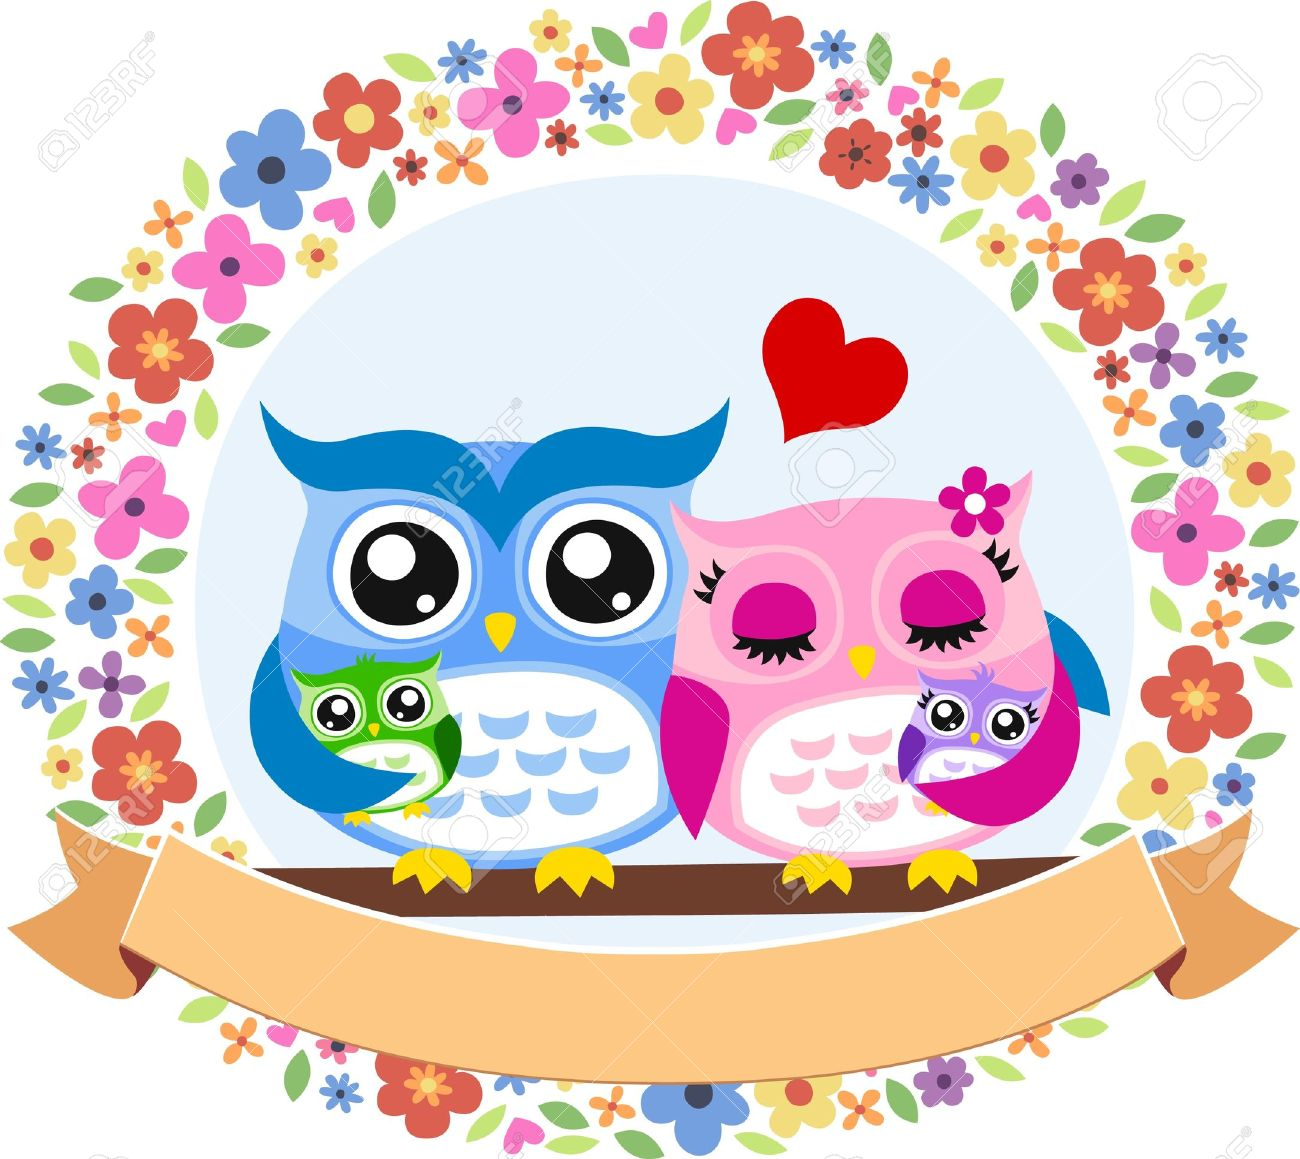 owl bird family floral frame emblem royalty free cliparts vectors  - owl bird family floral frame emblem stock vector